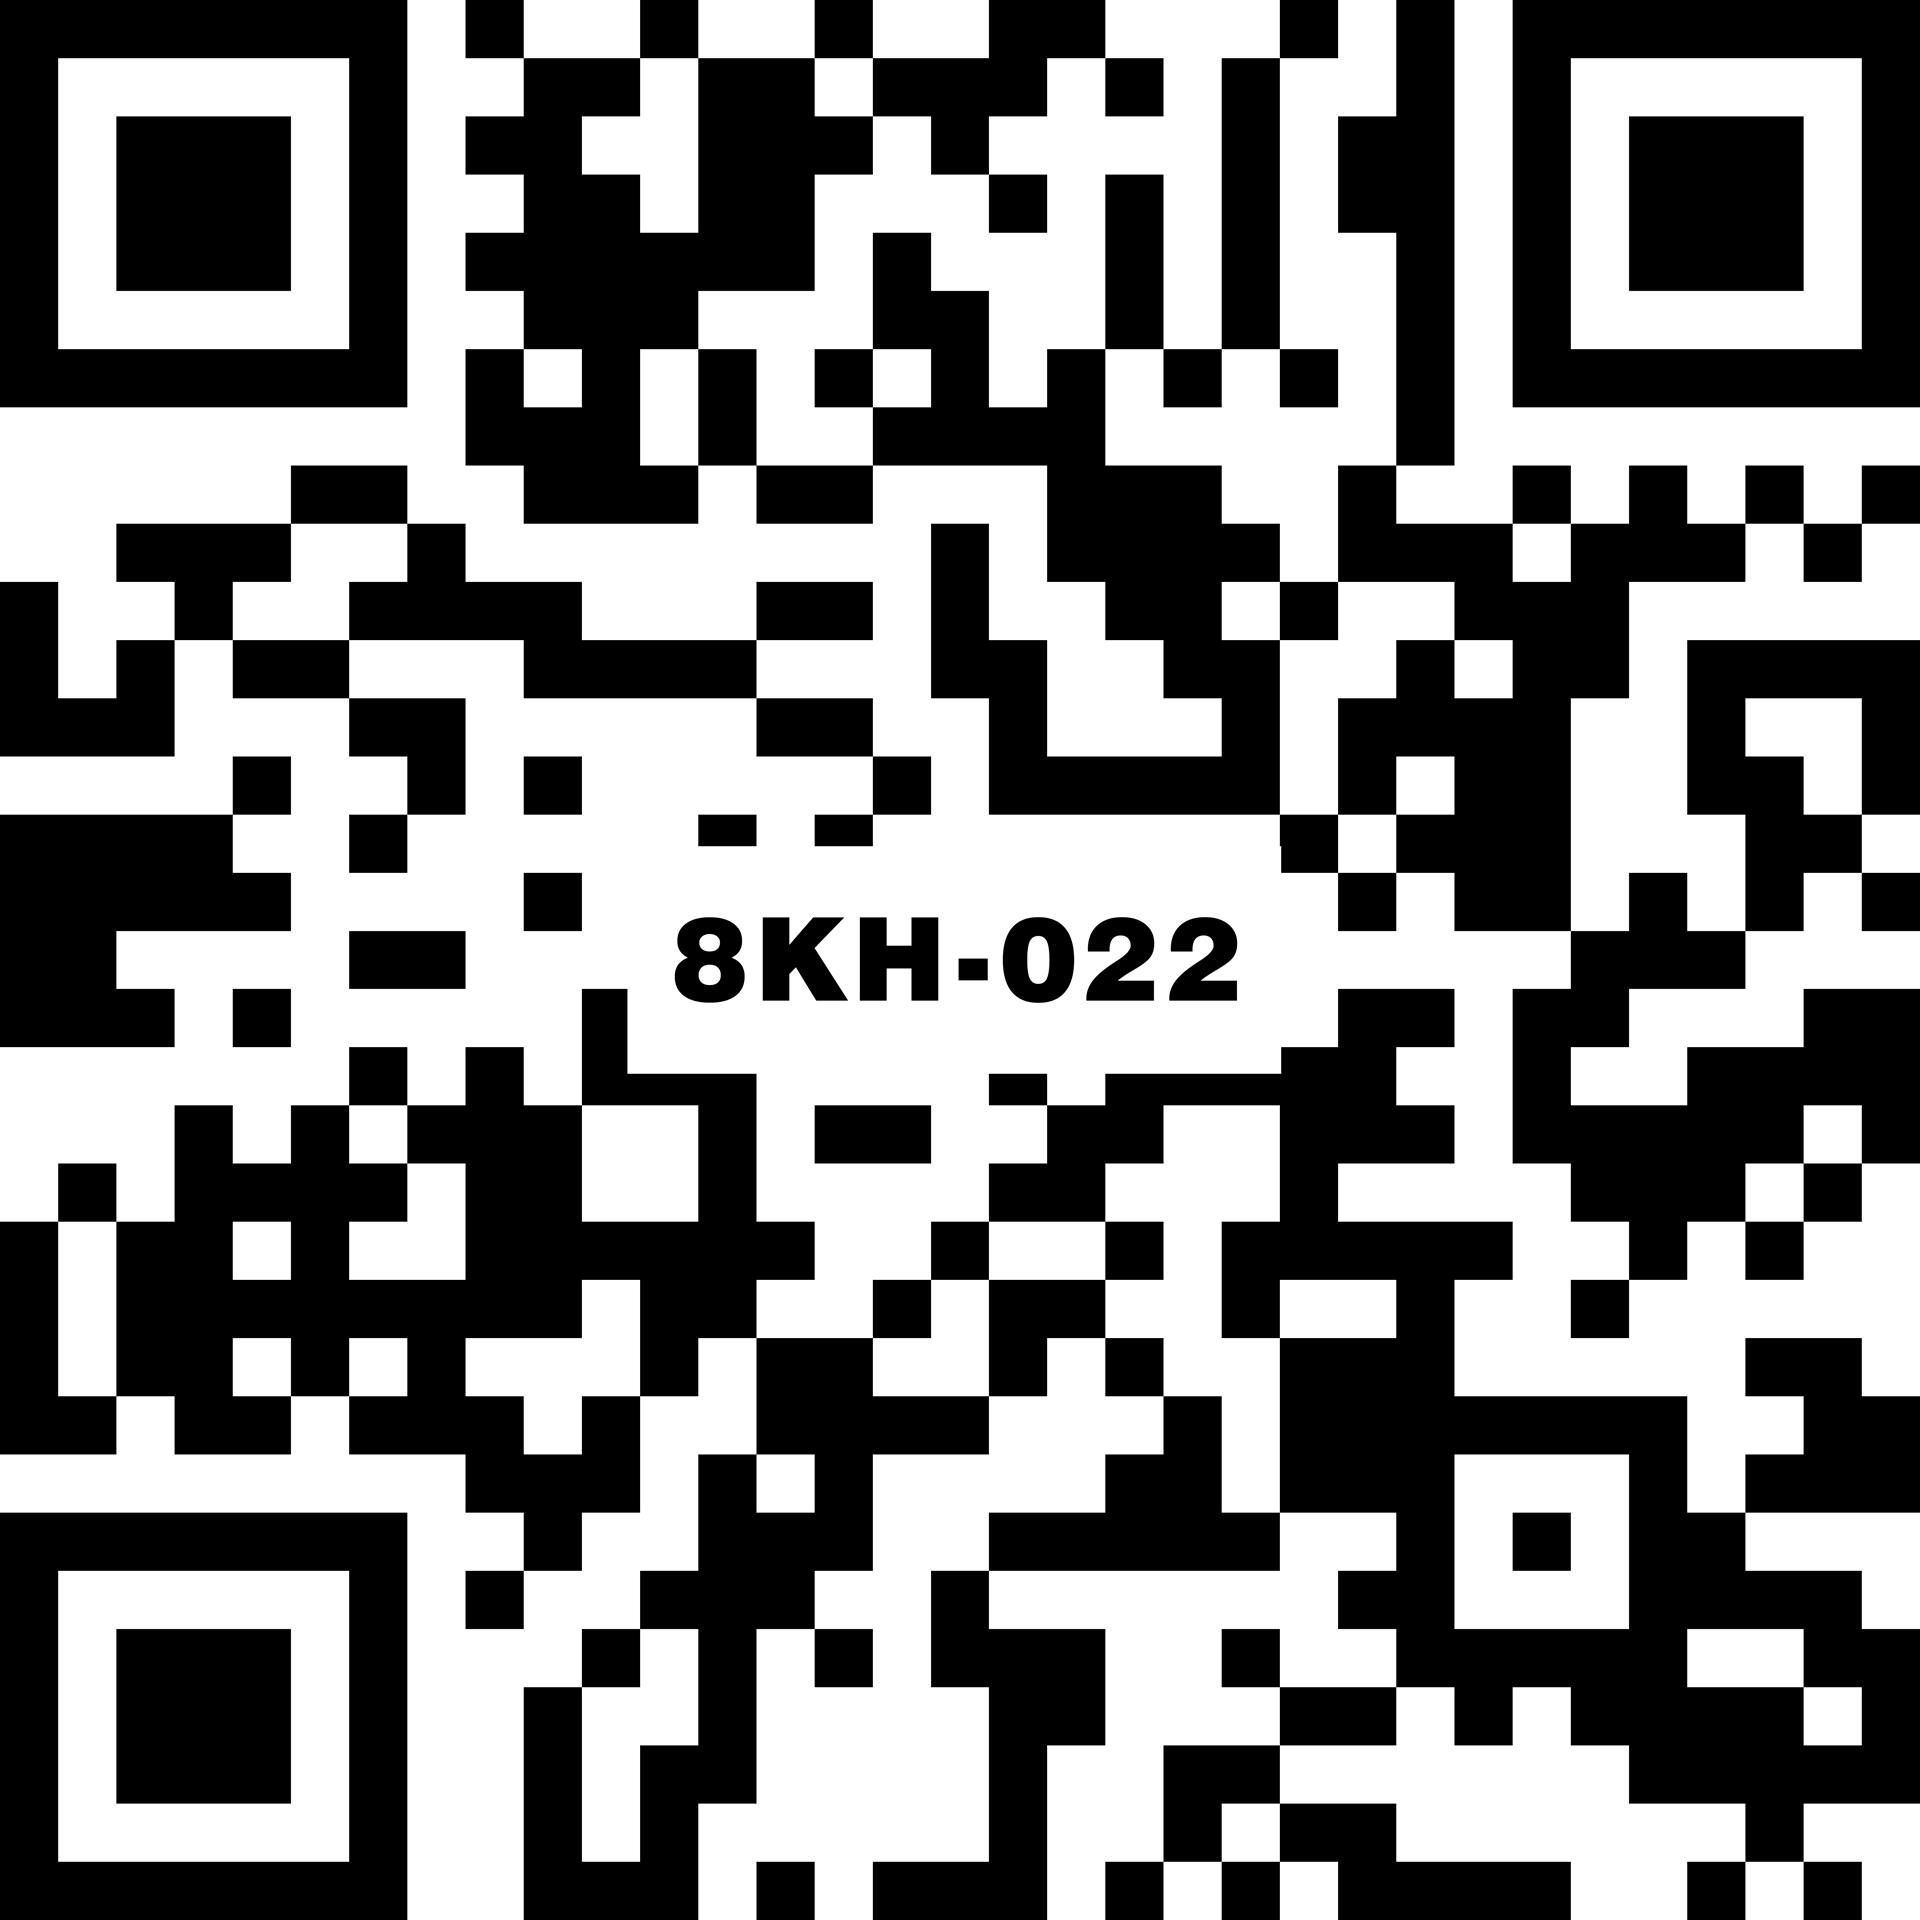 8KH-022